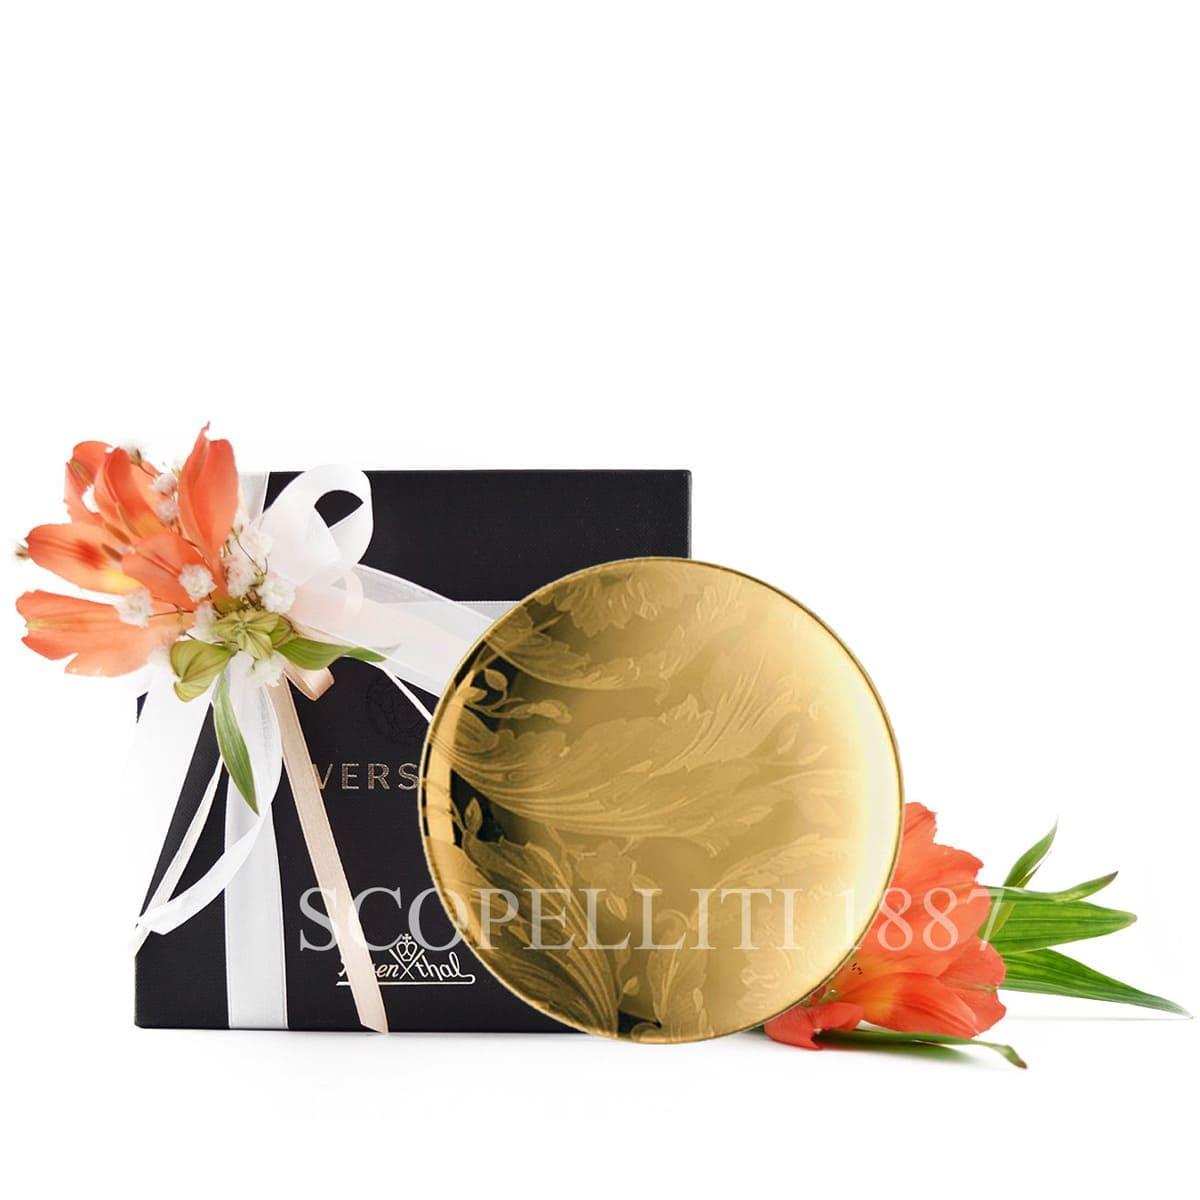 versace italian designer vanity la doree small plate